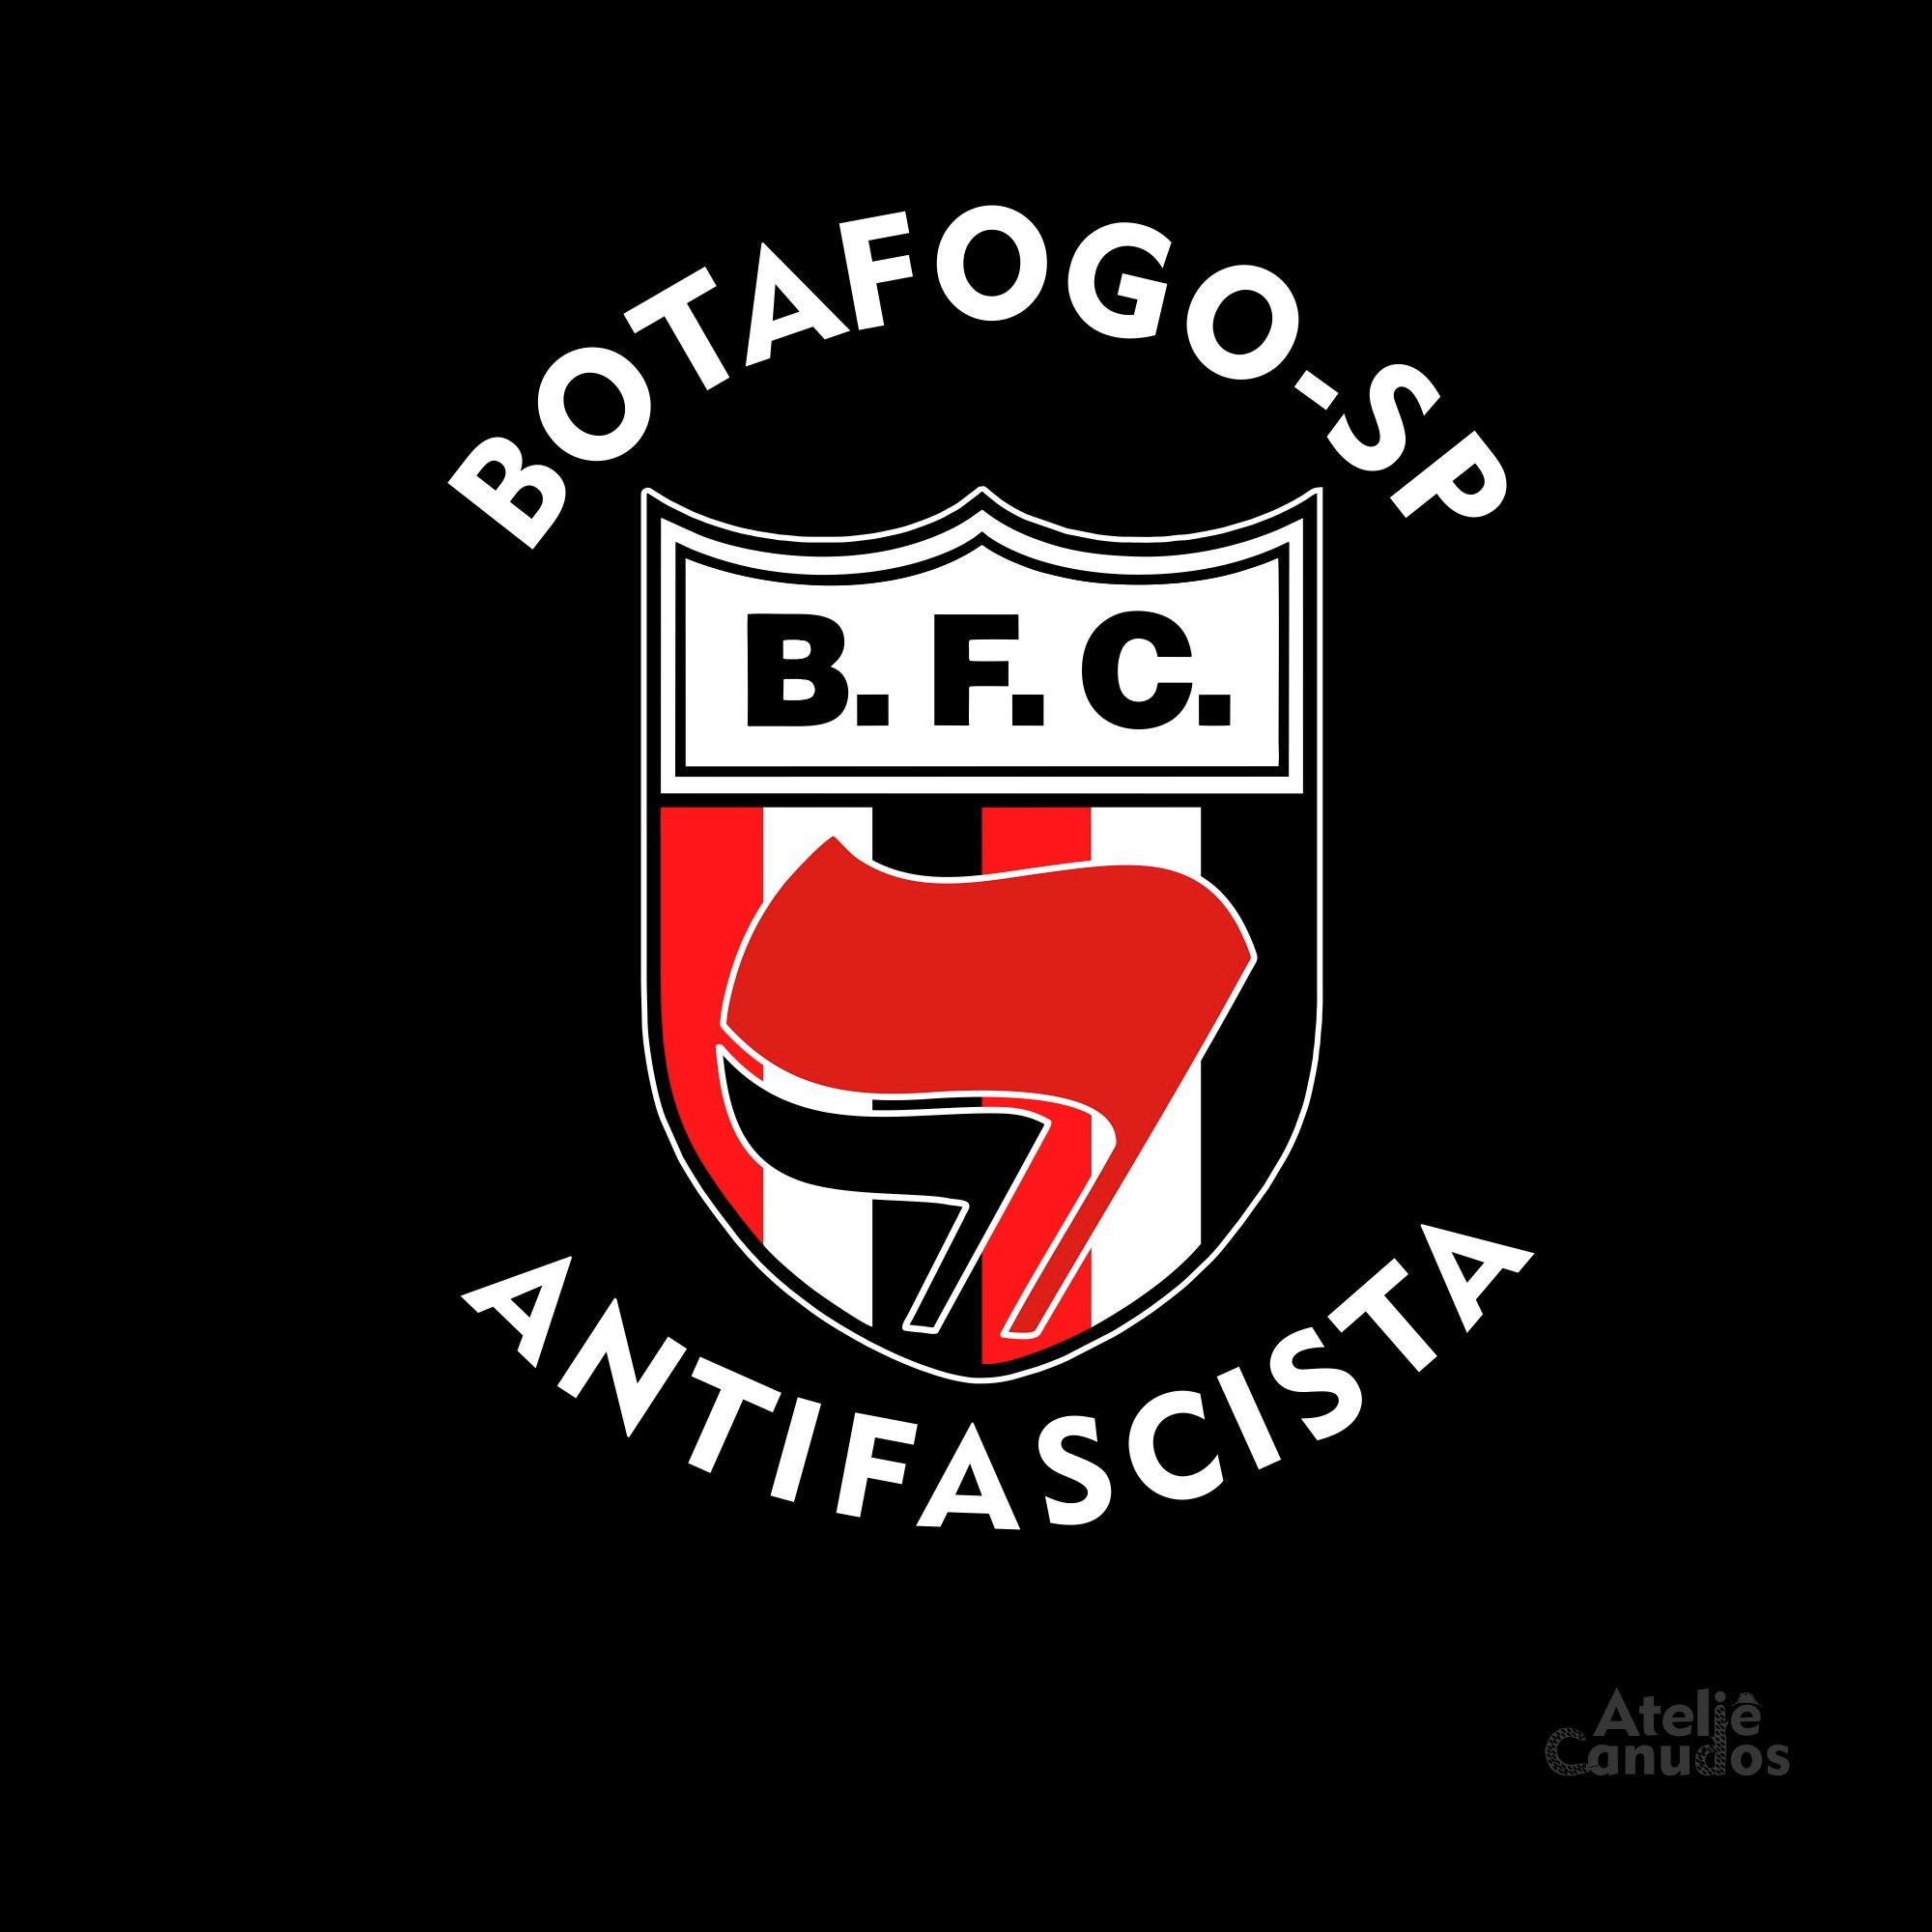 bc4063ba21 Camisa Botafogo SP antifascista INFANTIL - branca no Elo7